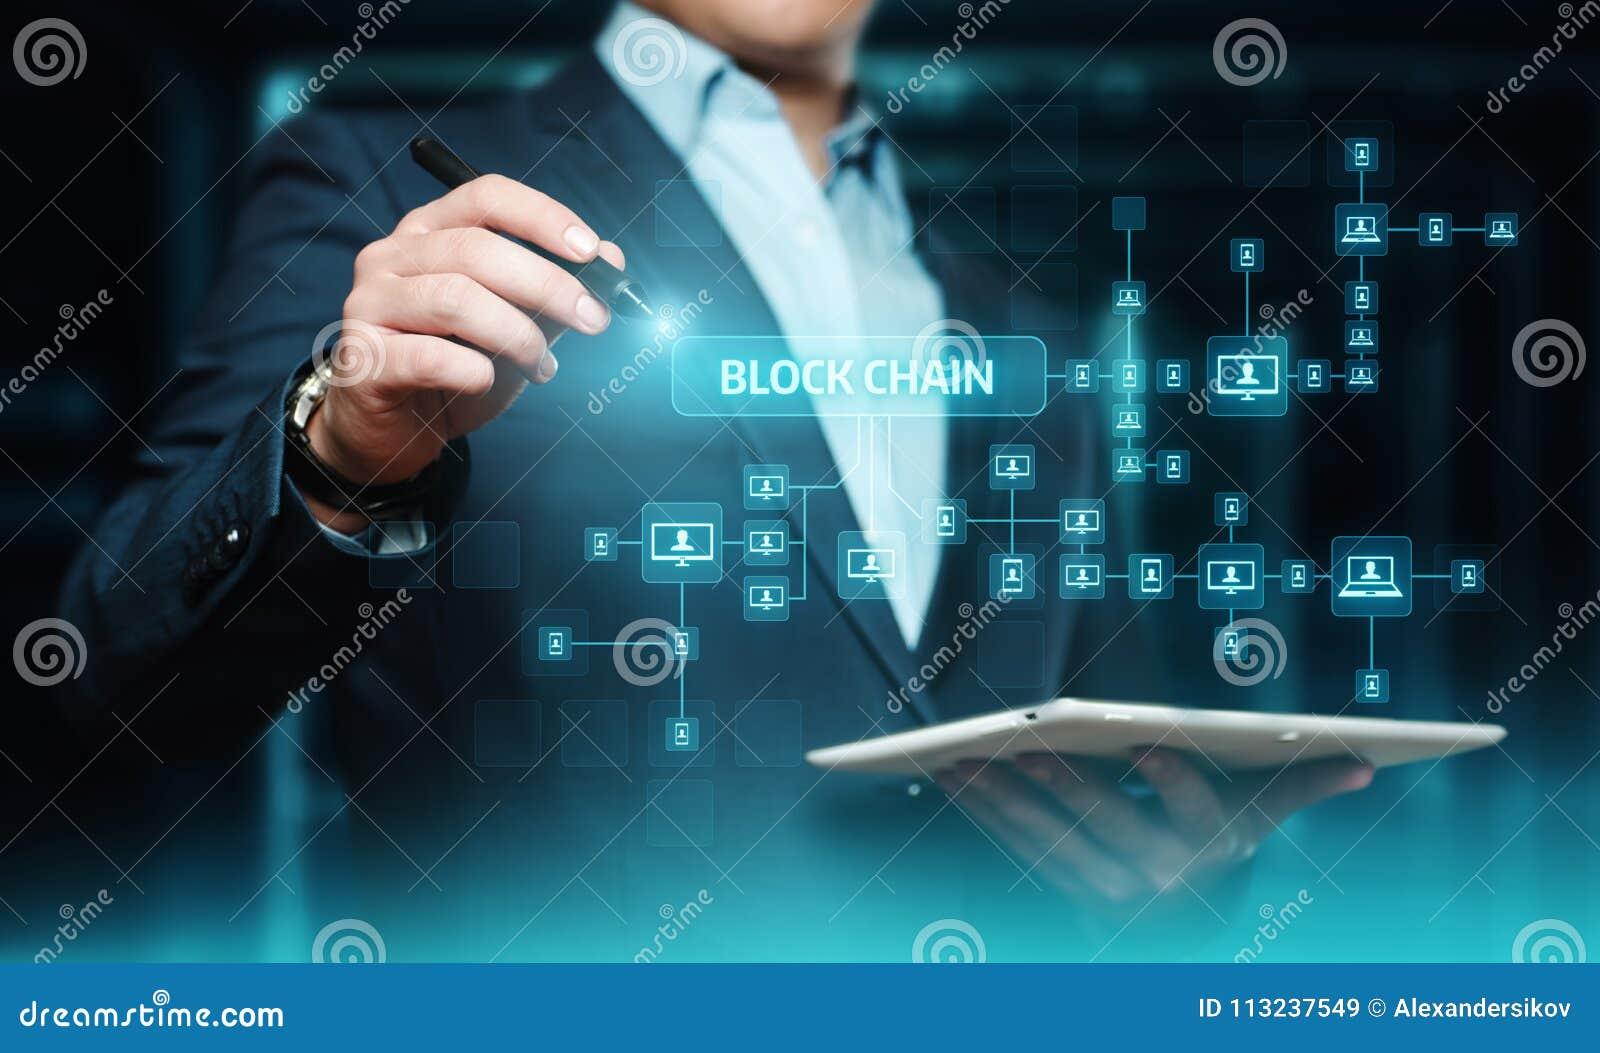 Blockchain encryption Blocks Security Finance Fintech Network Internet Technology Concept